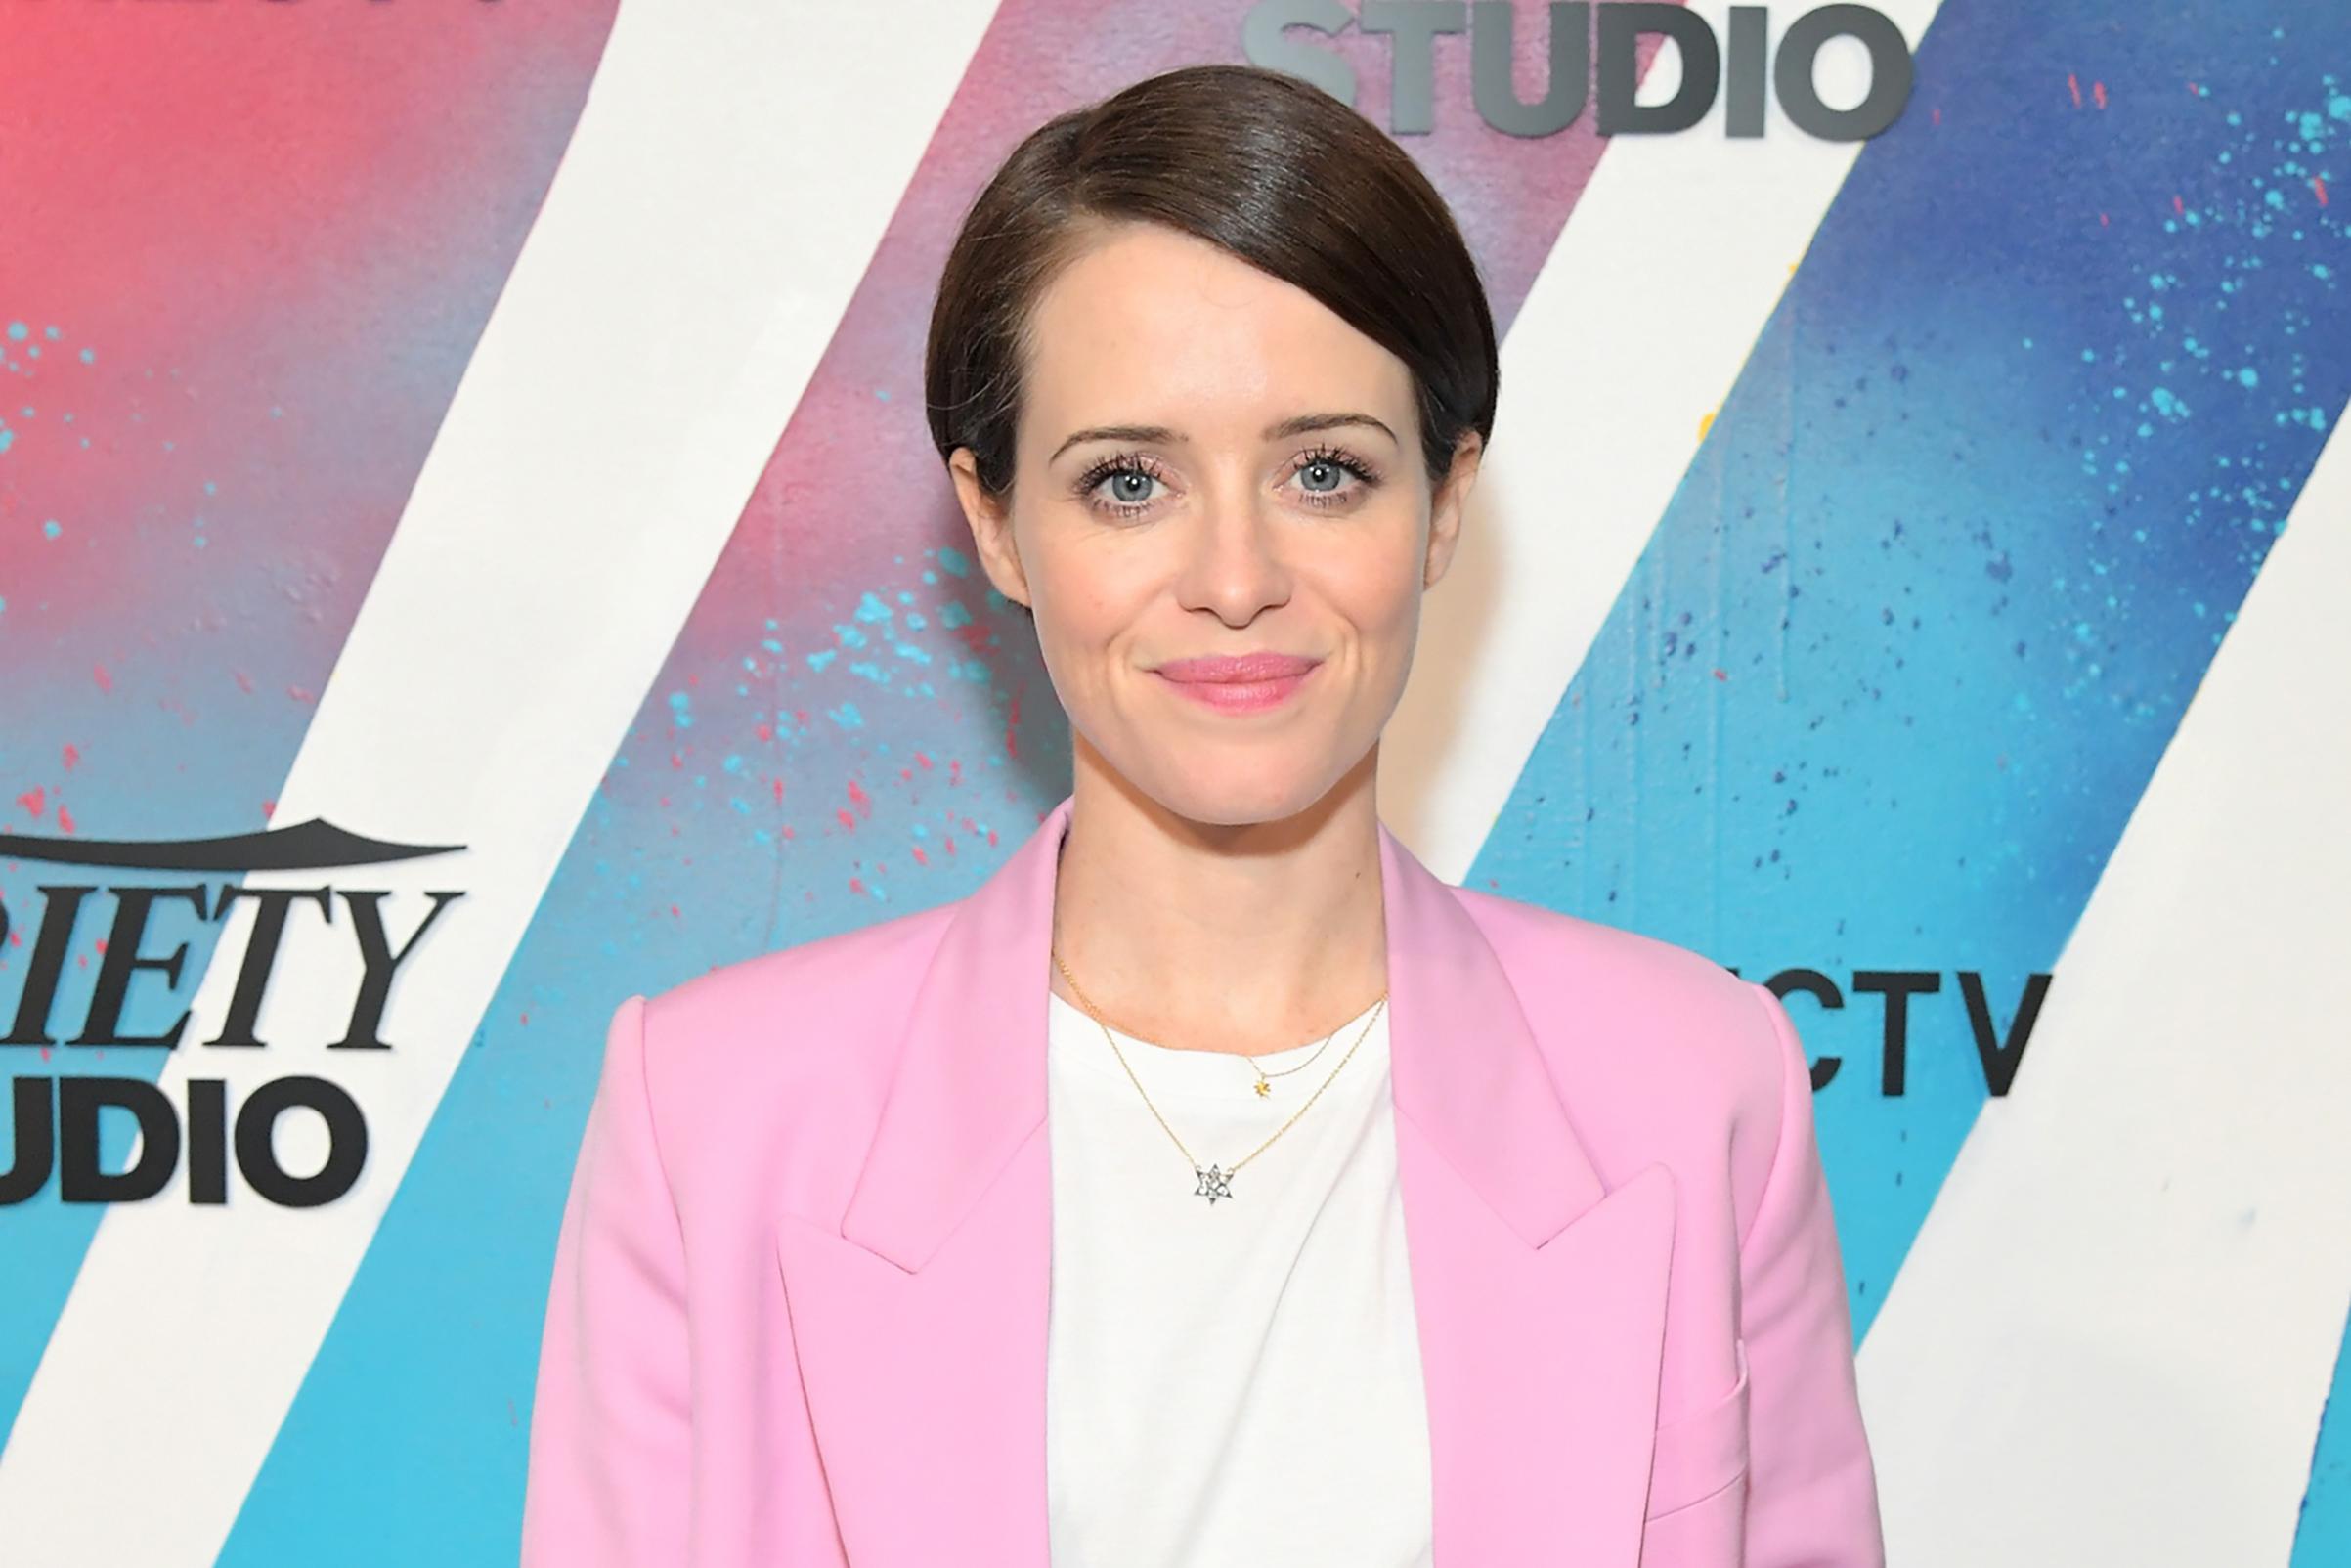 Claire Foy during Toronto International Film Festival on Sept. 10, 2018.